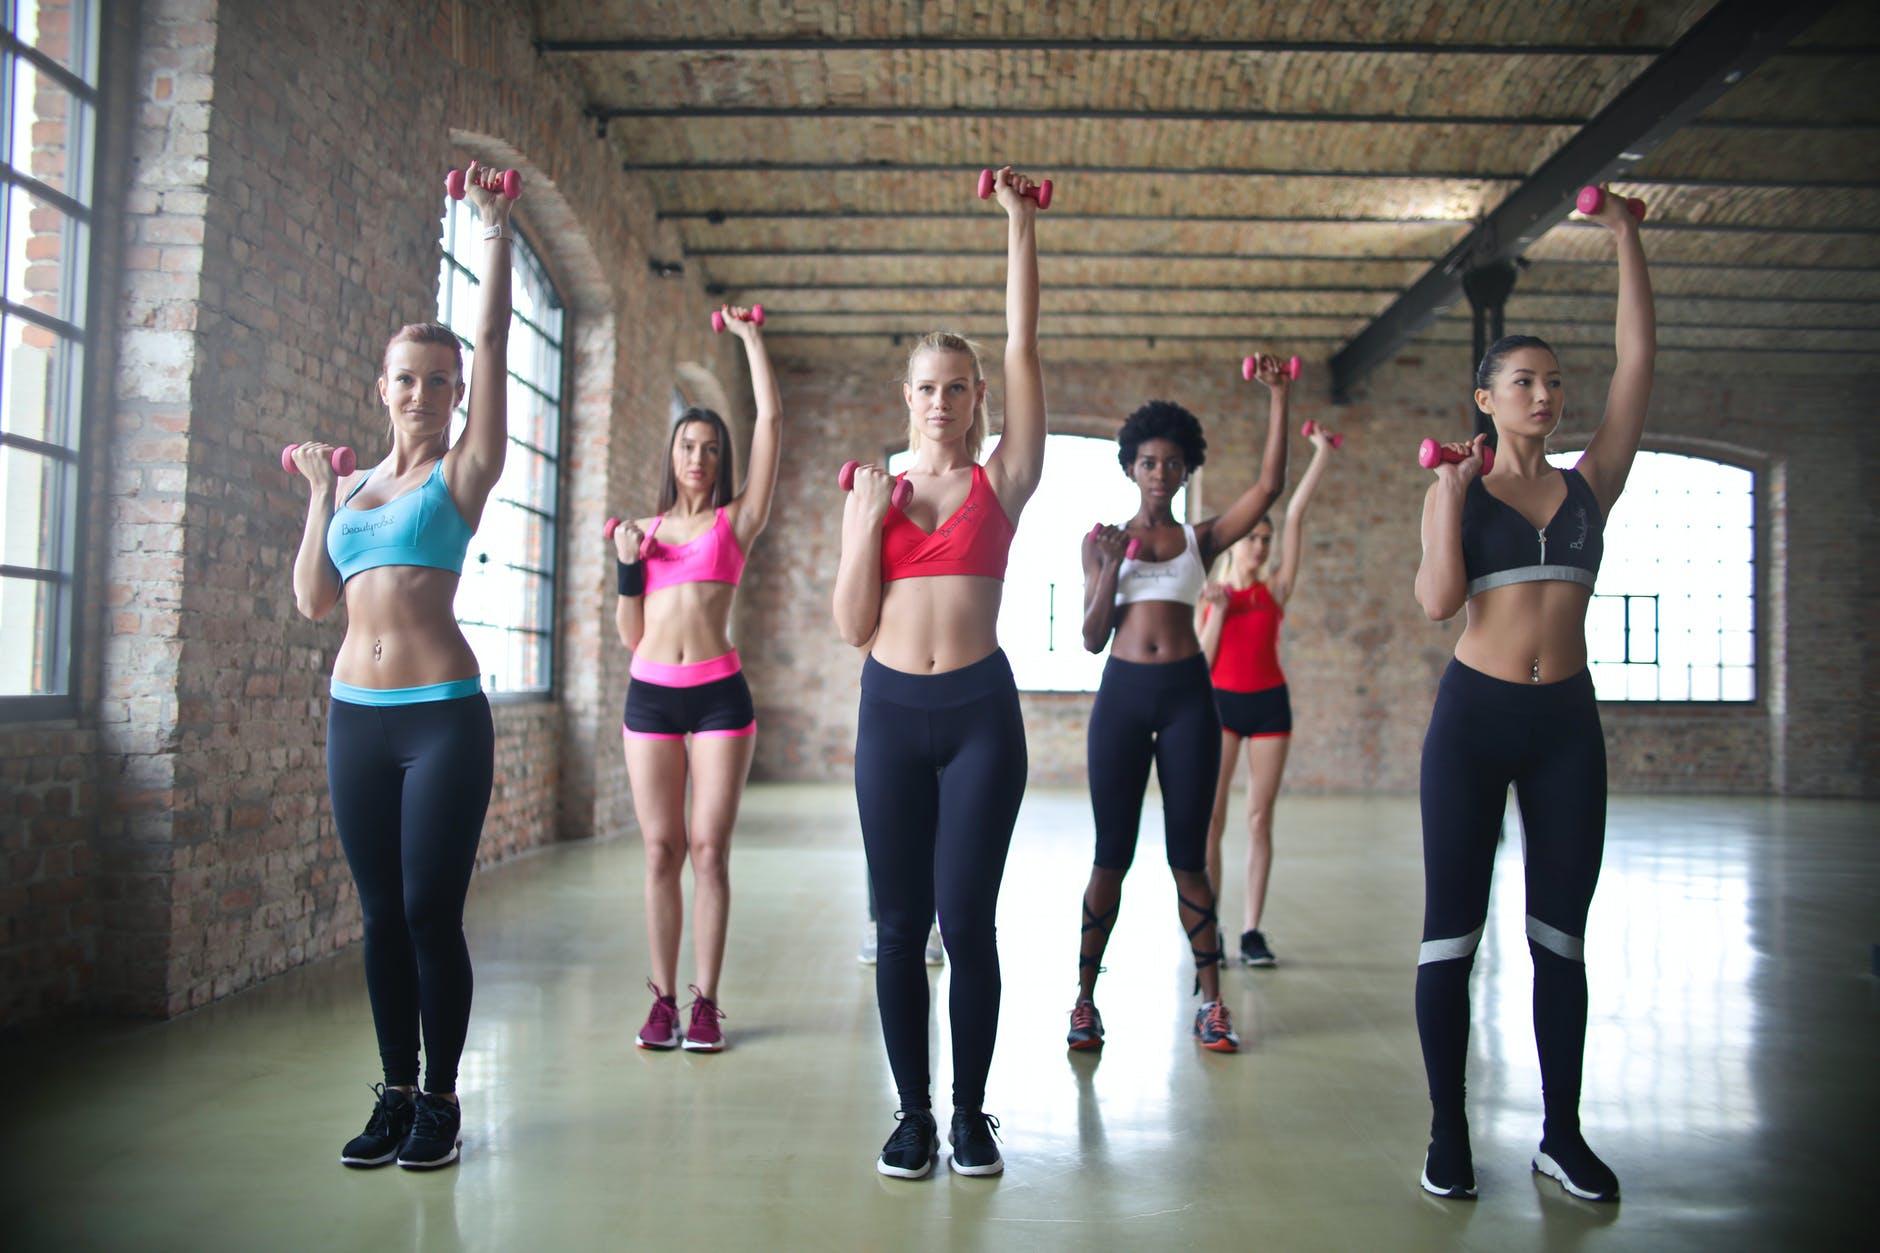 sport leggings de compresión